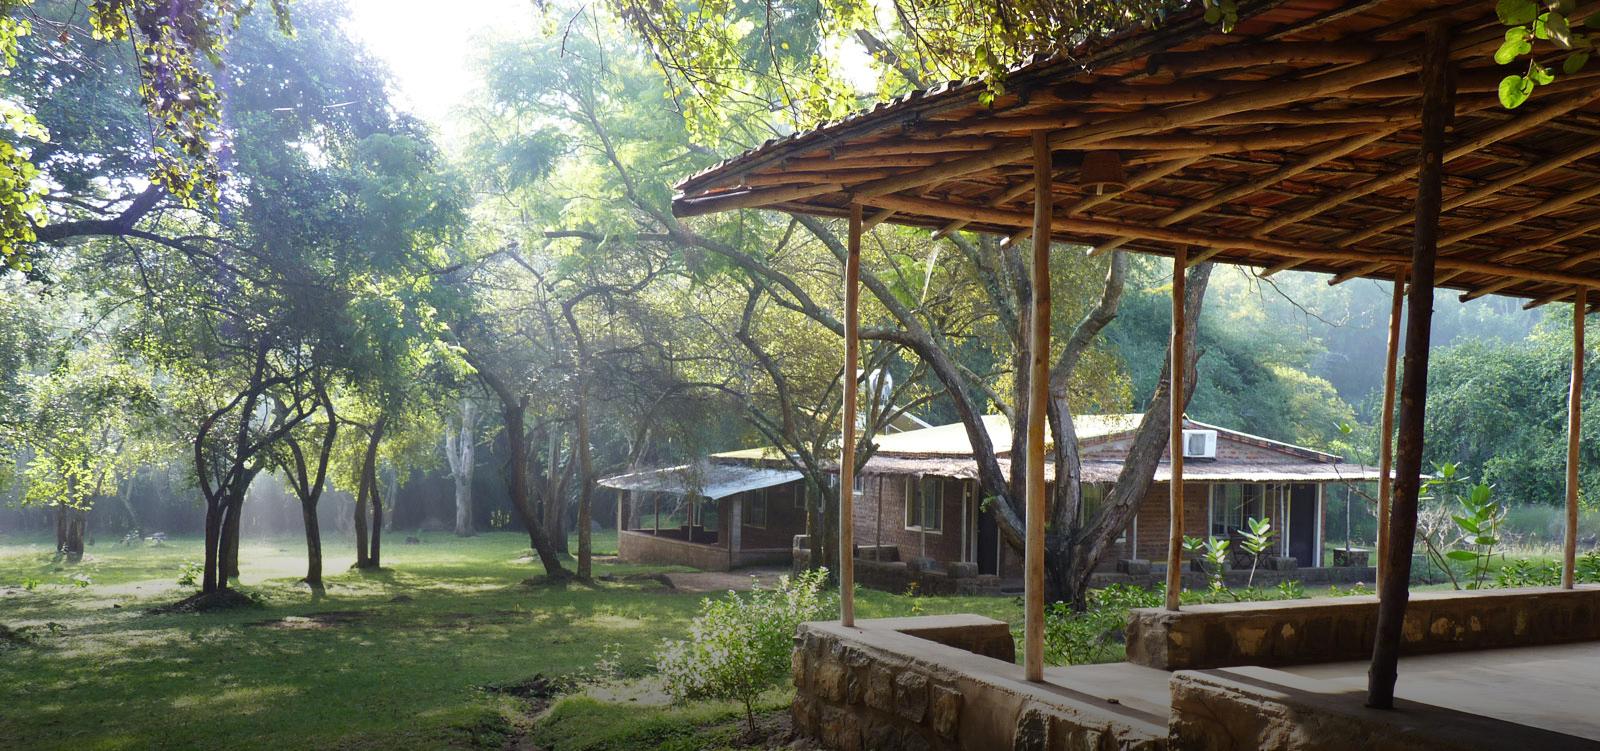 huts in forest indiaக்கான பட முடிவுகள்